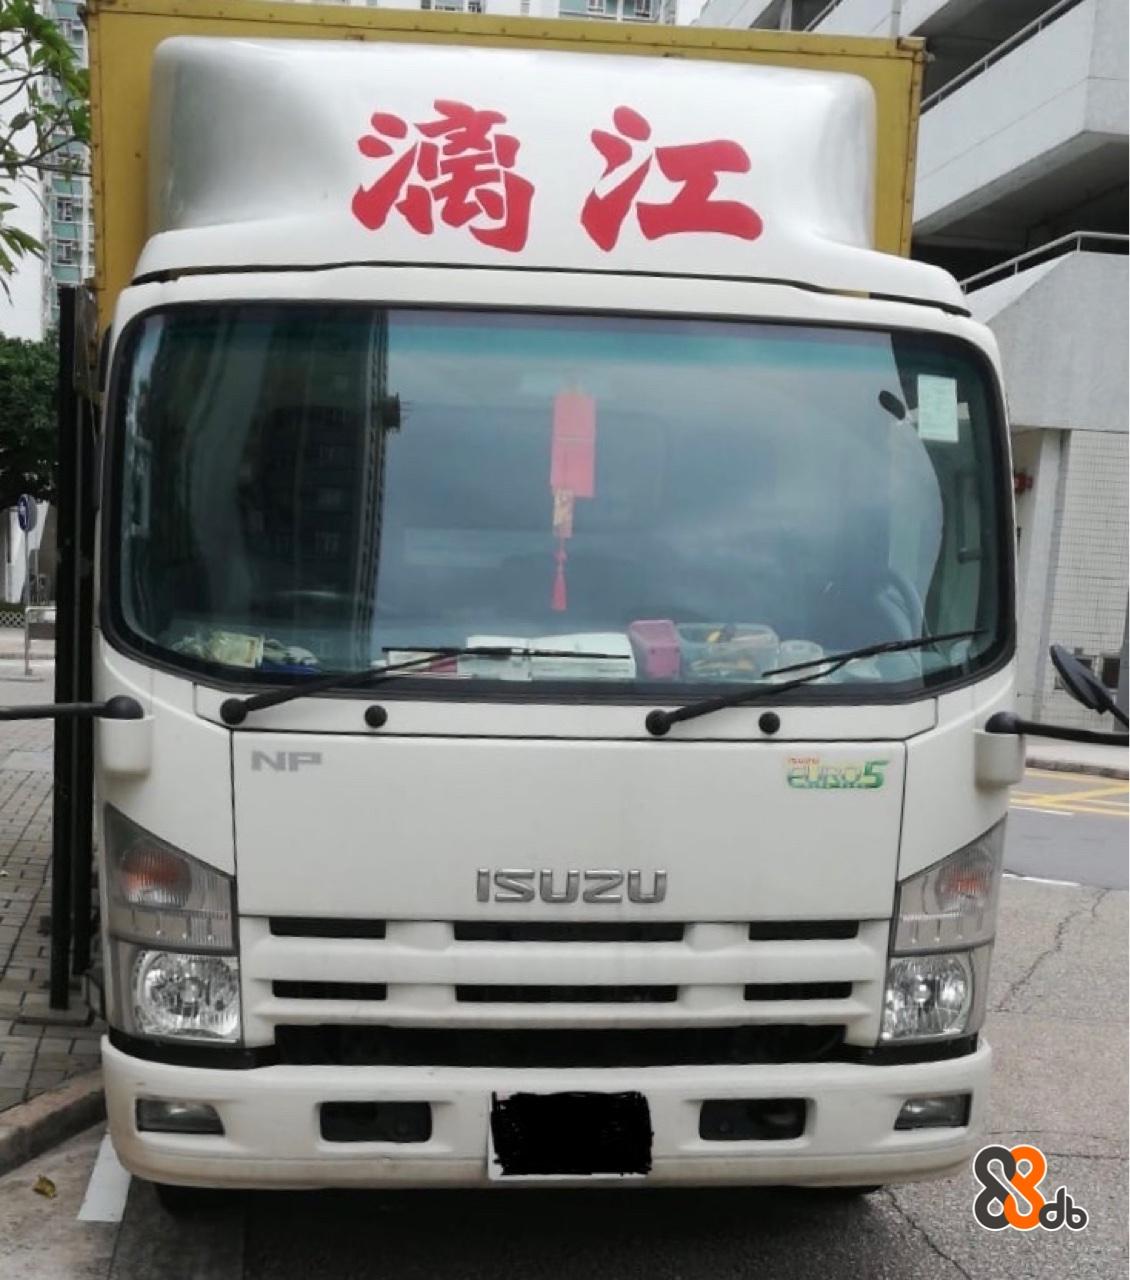 Land vehicle,Vehicle,Car,Transport,Mode of transport